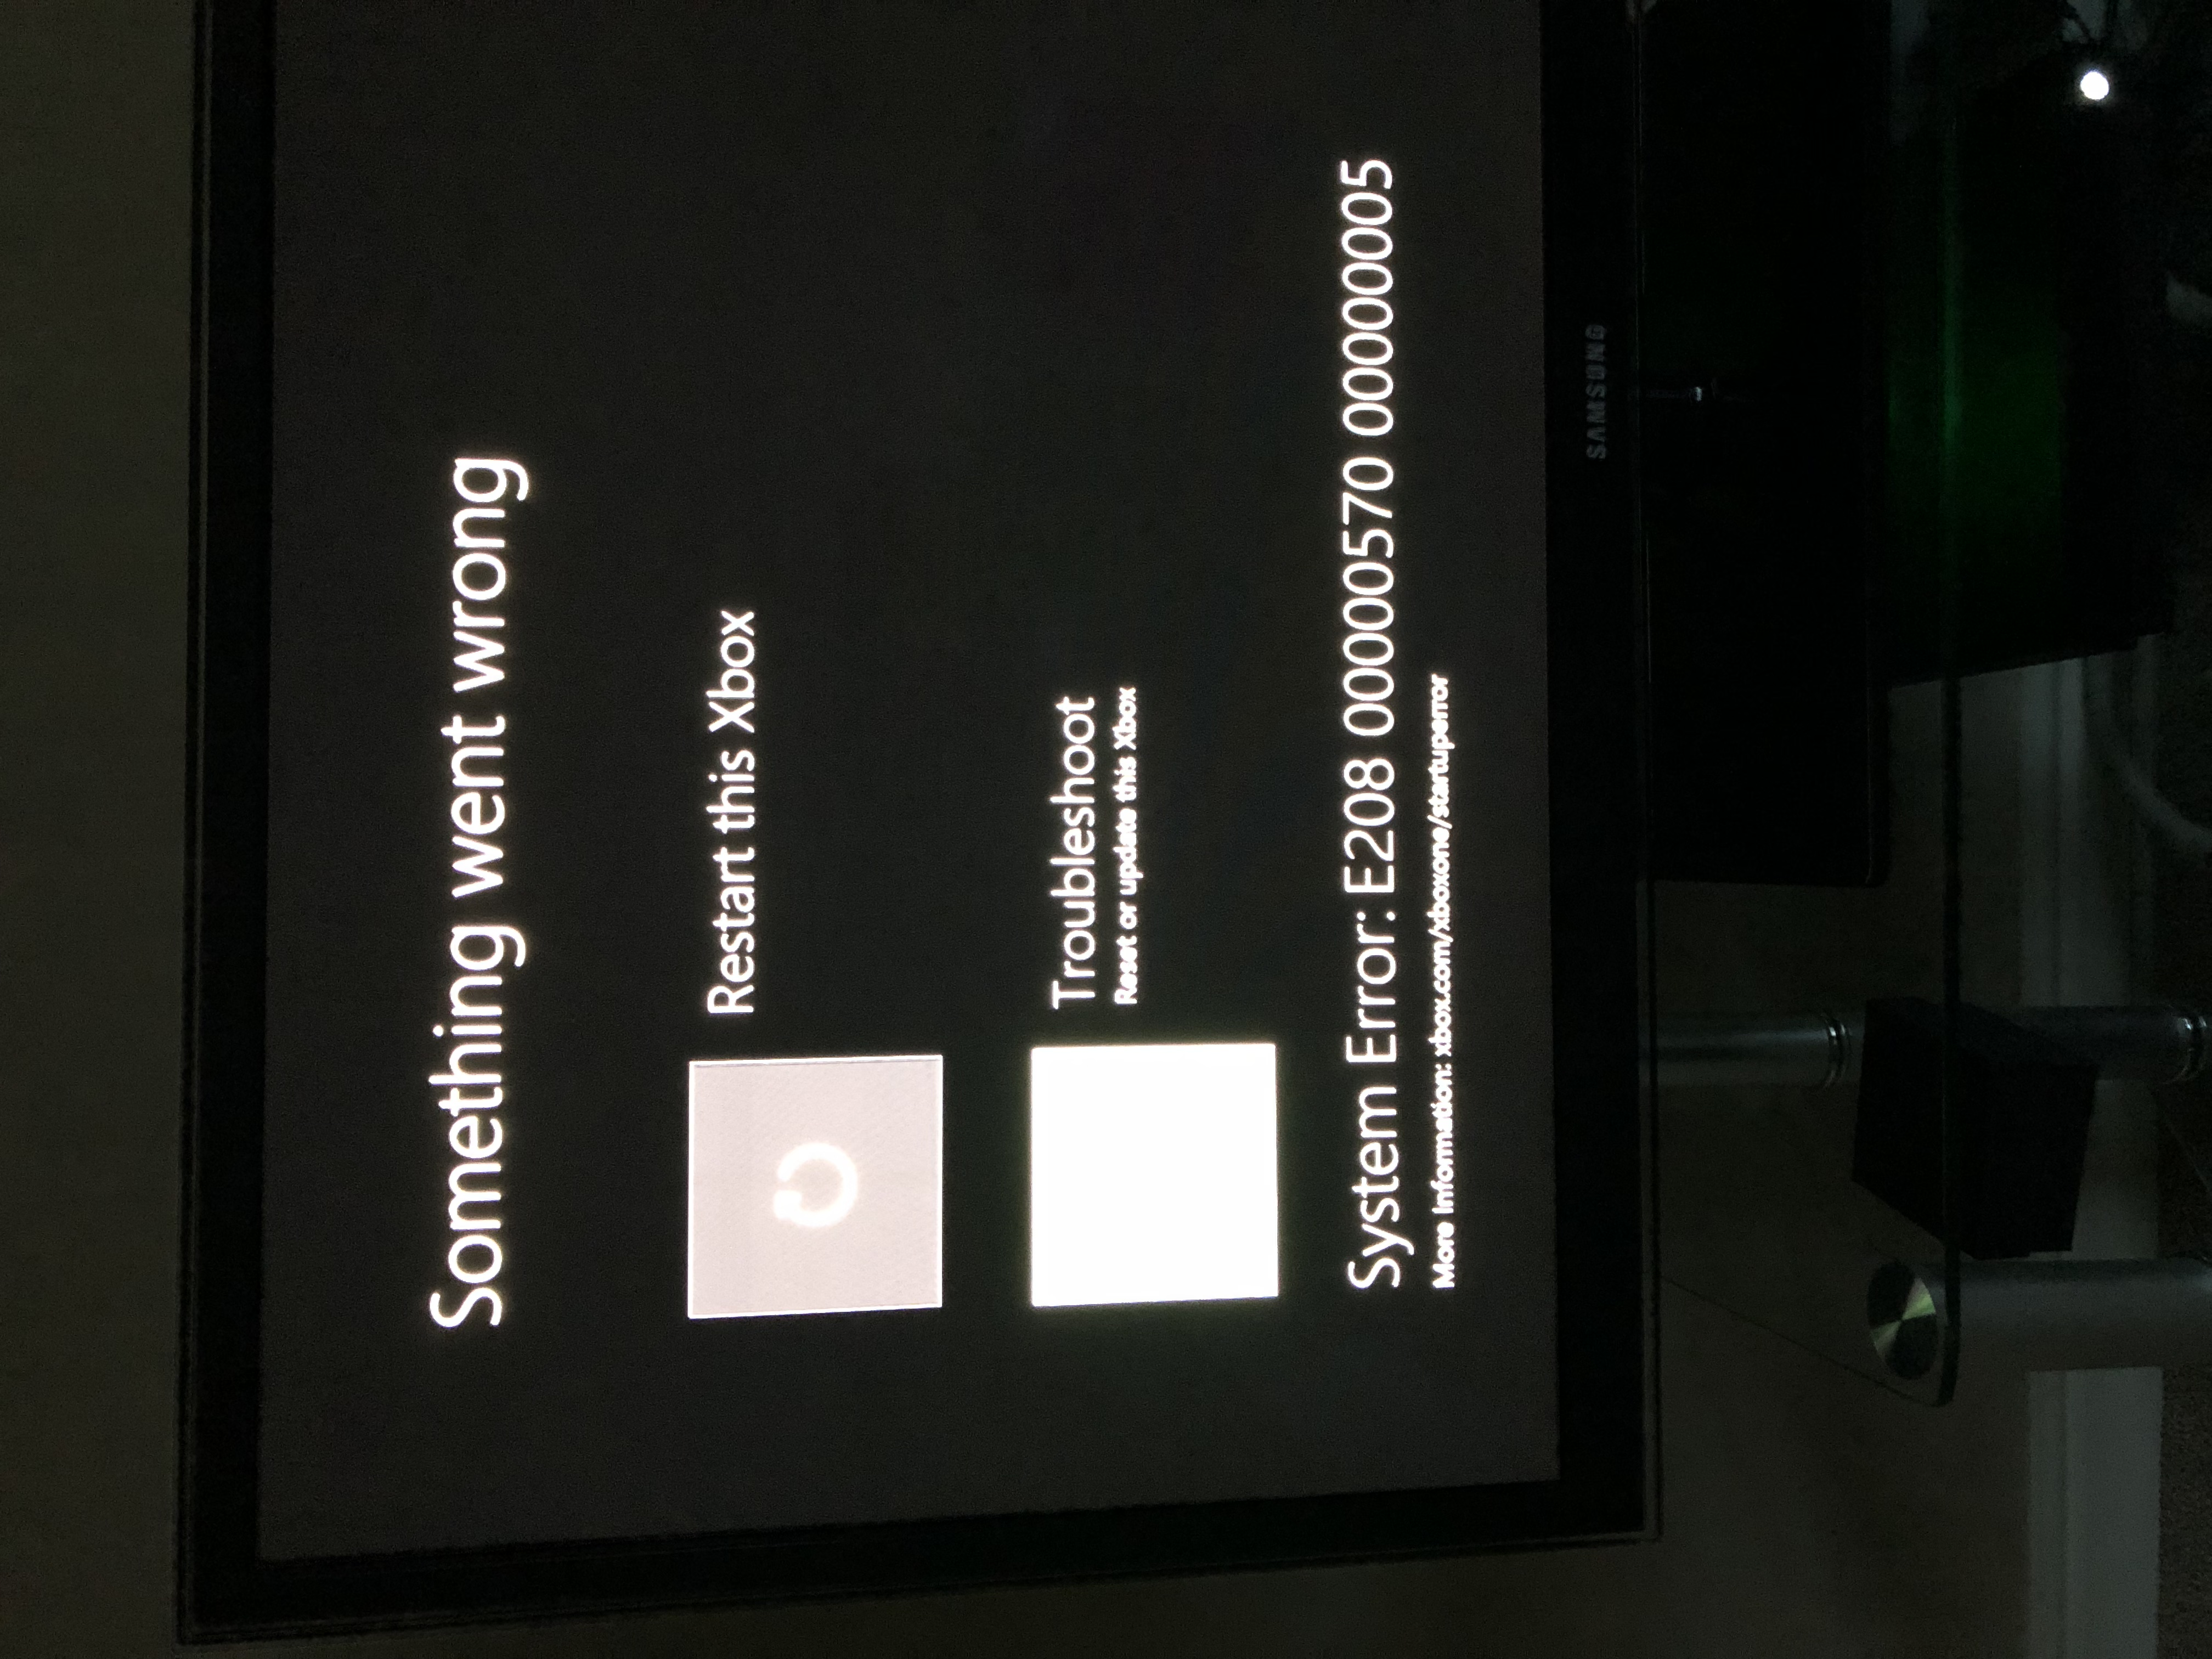 Start up error E208 00000570 00000005? - Microsoft Community